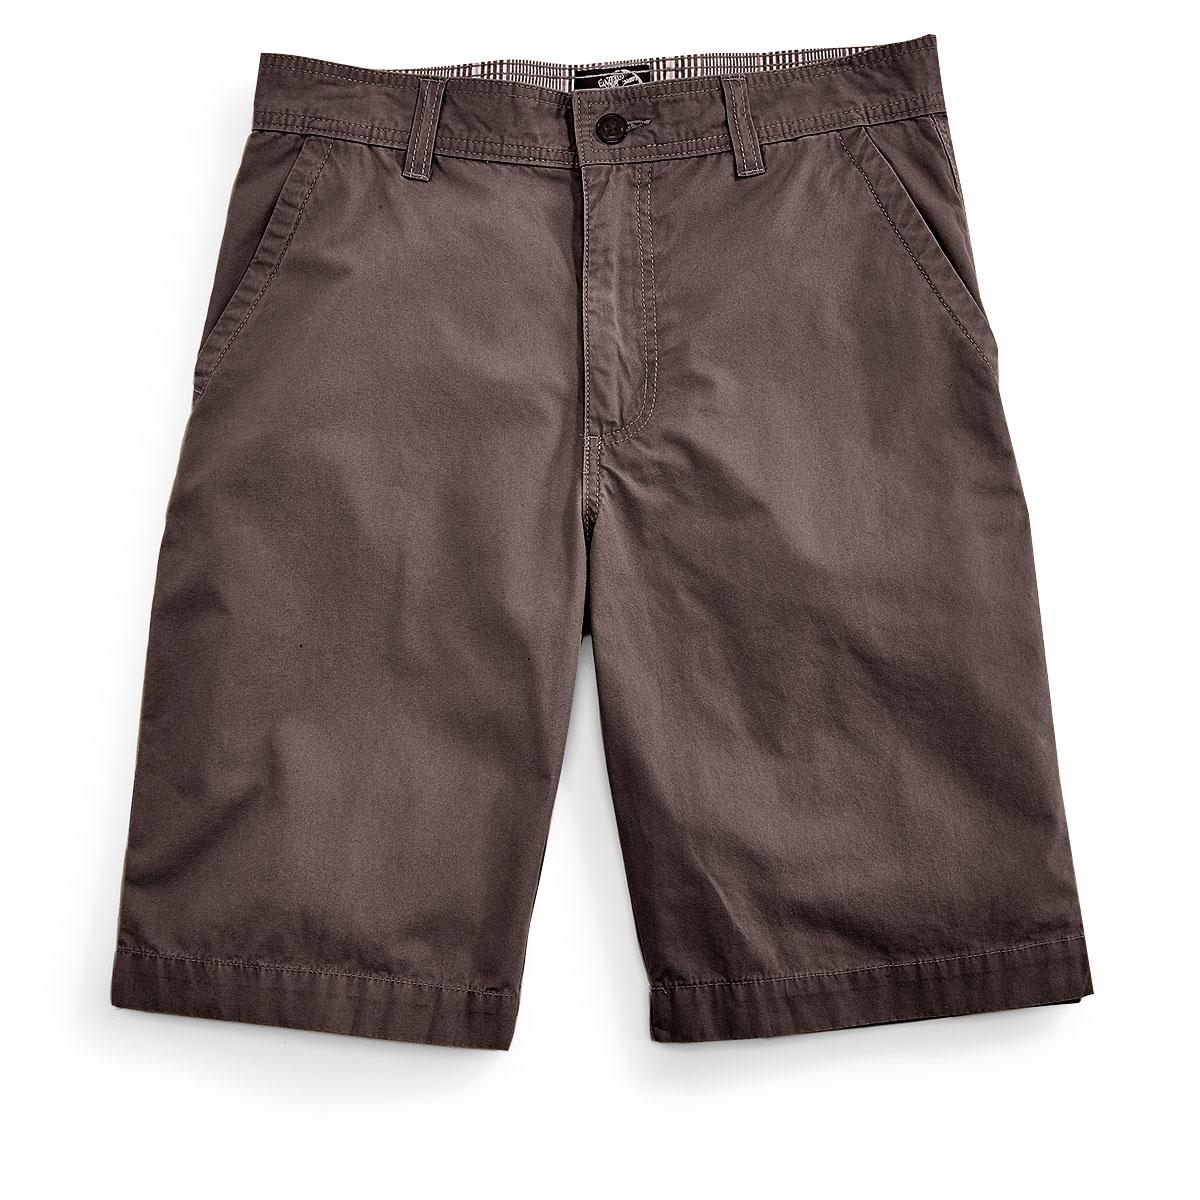 D55 Guys' Flat Front Shorts - Black, 32